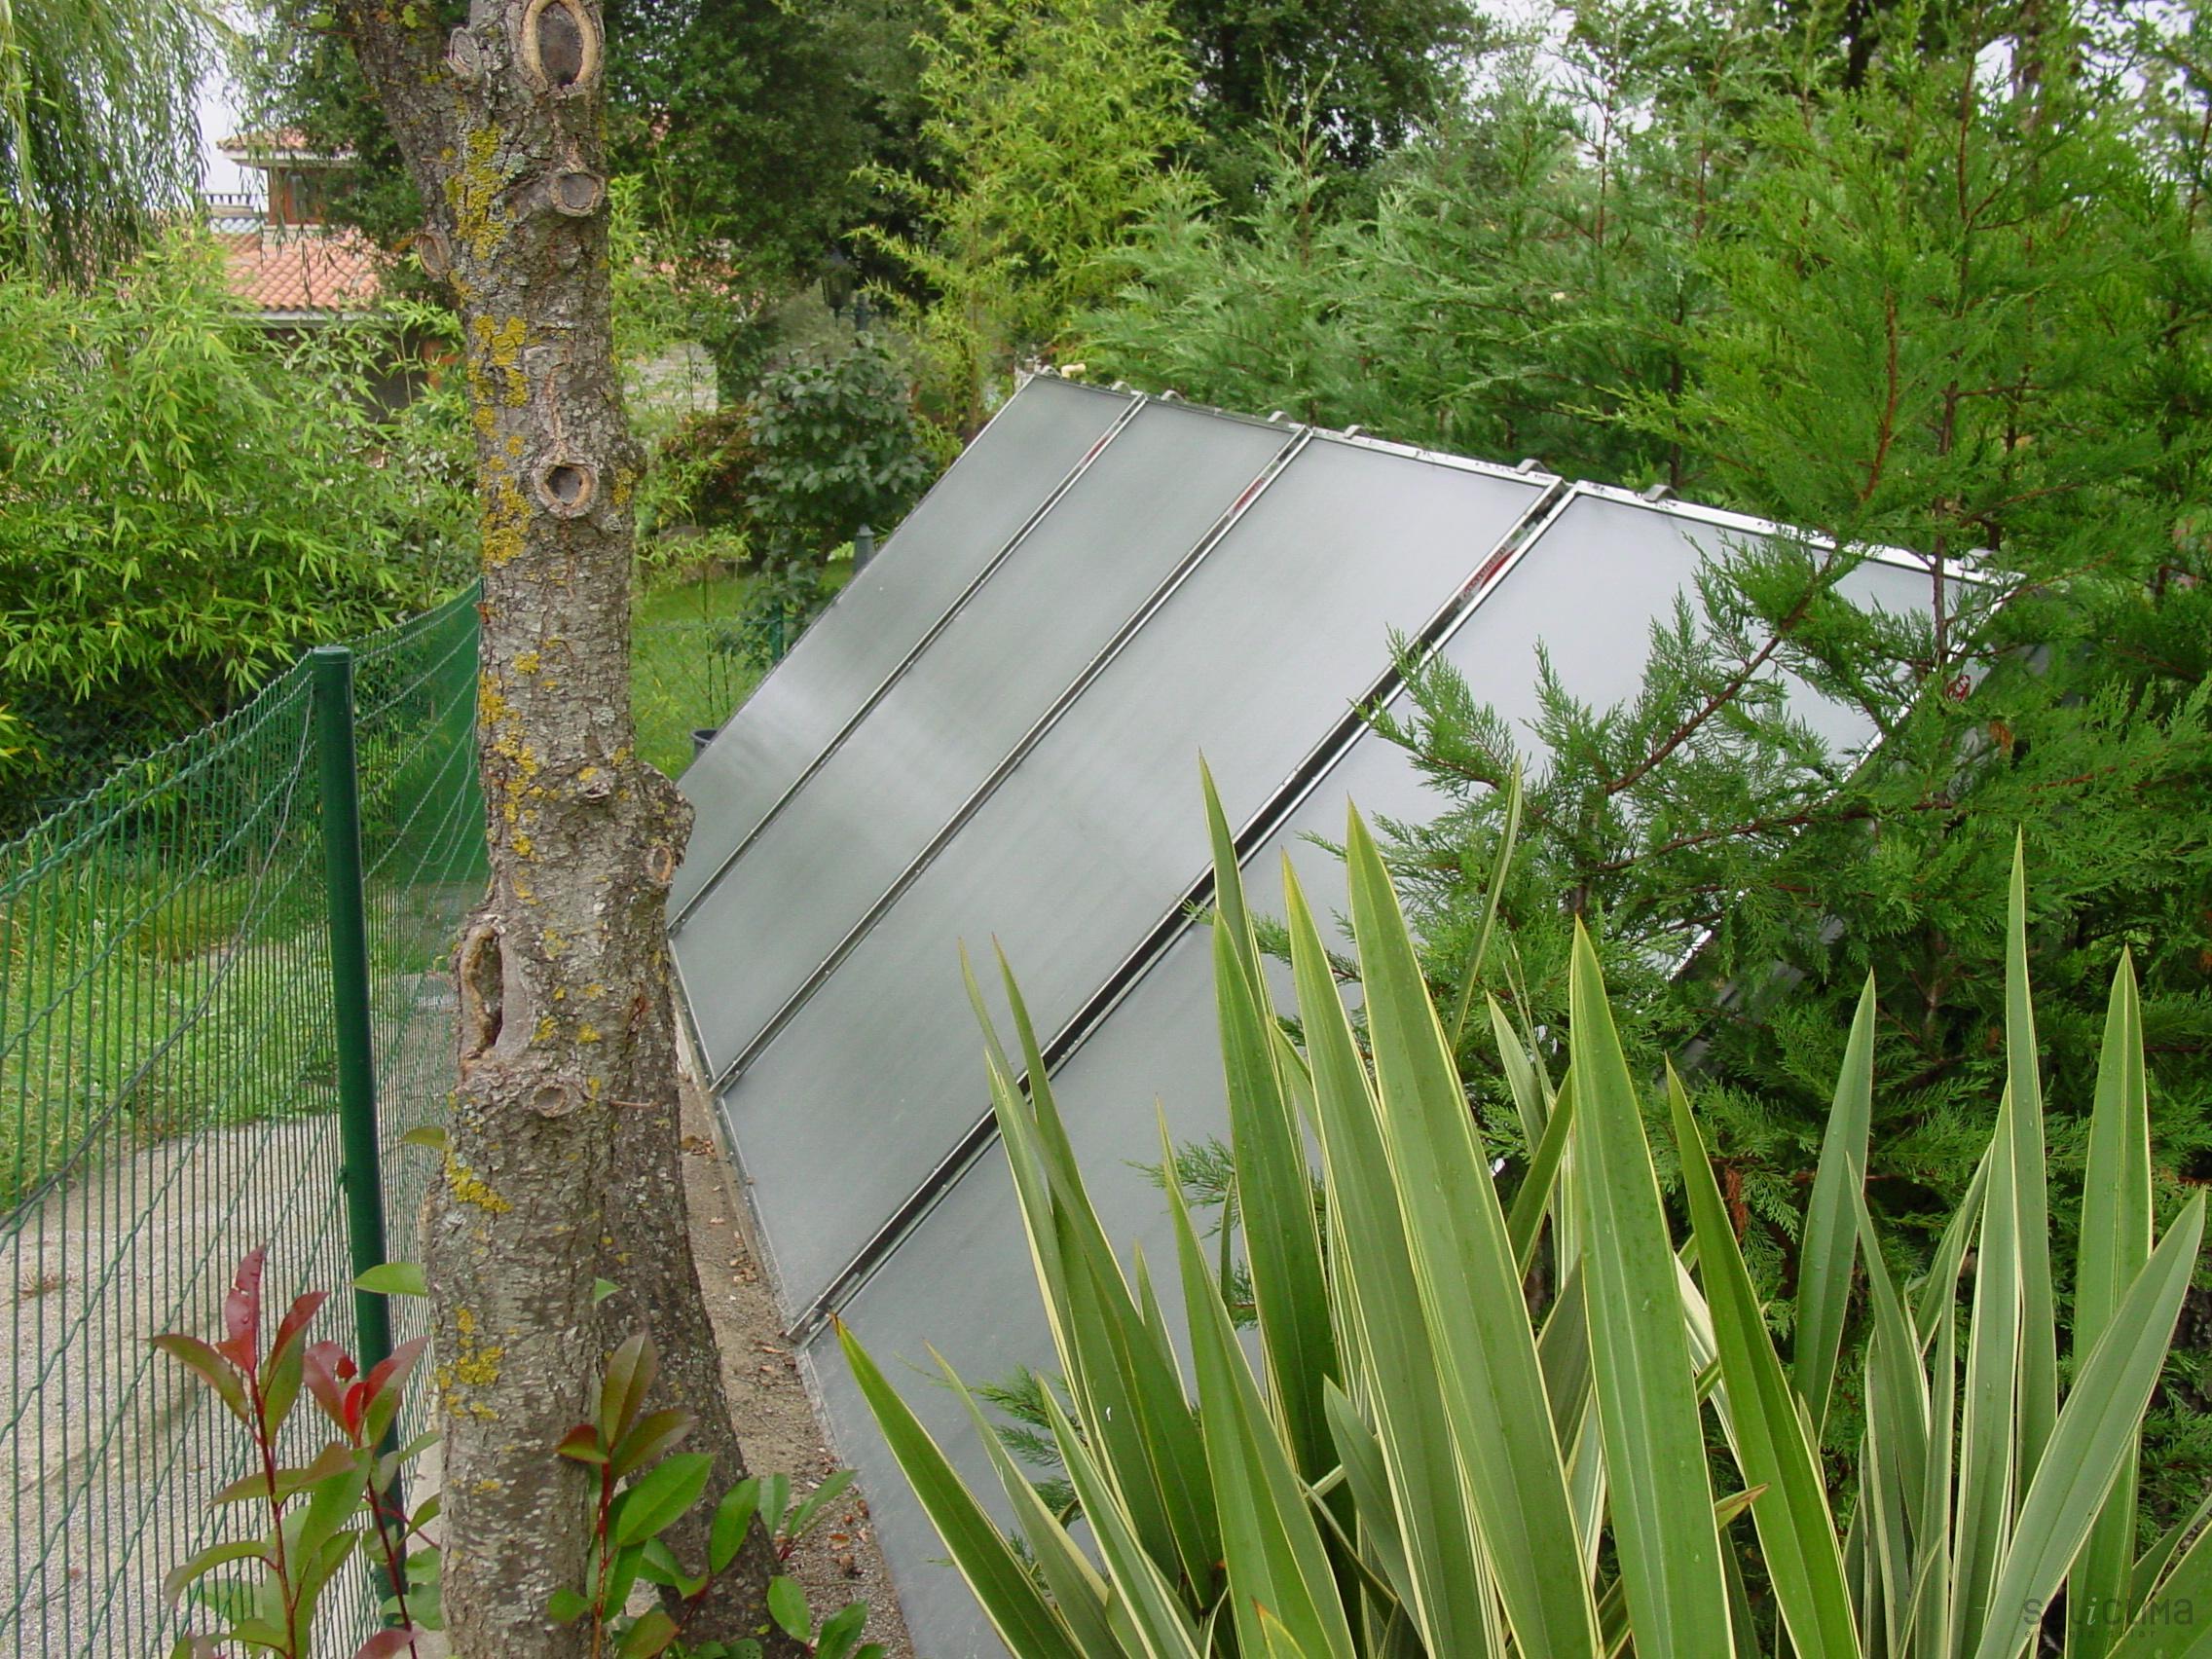 Energia solar badalona for Antorchas para jardin combustible